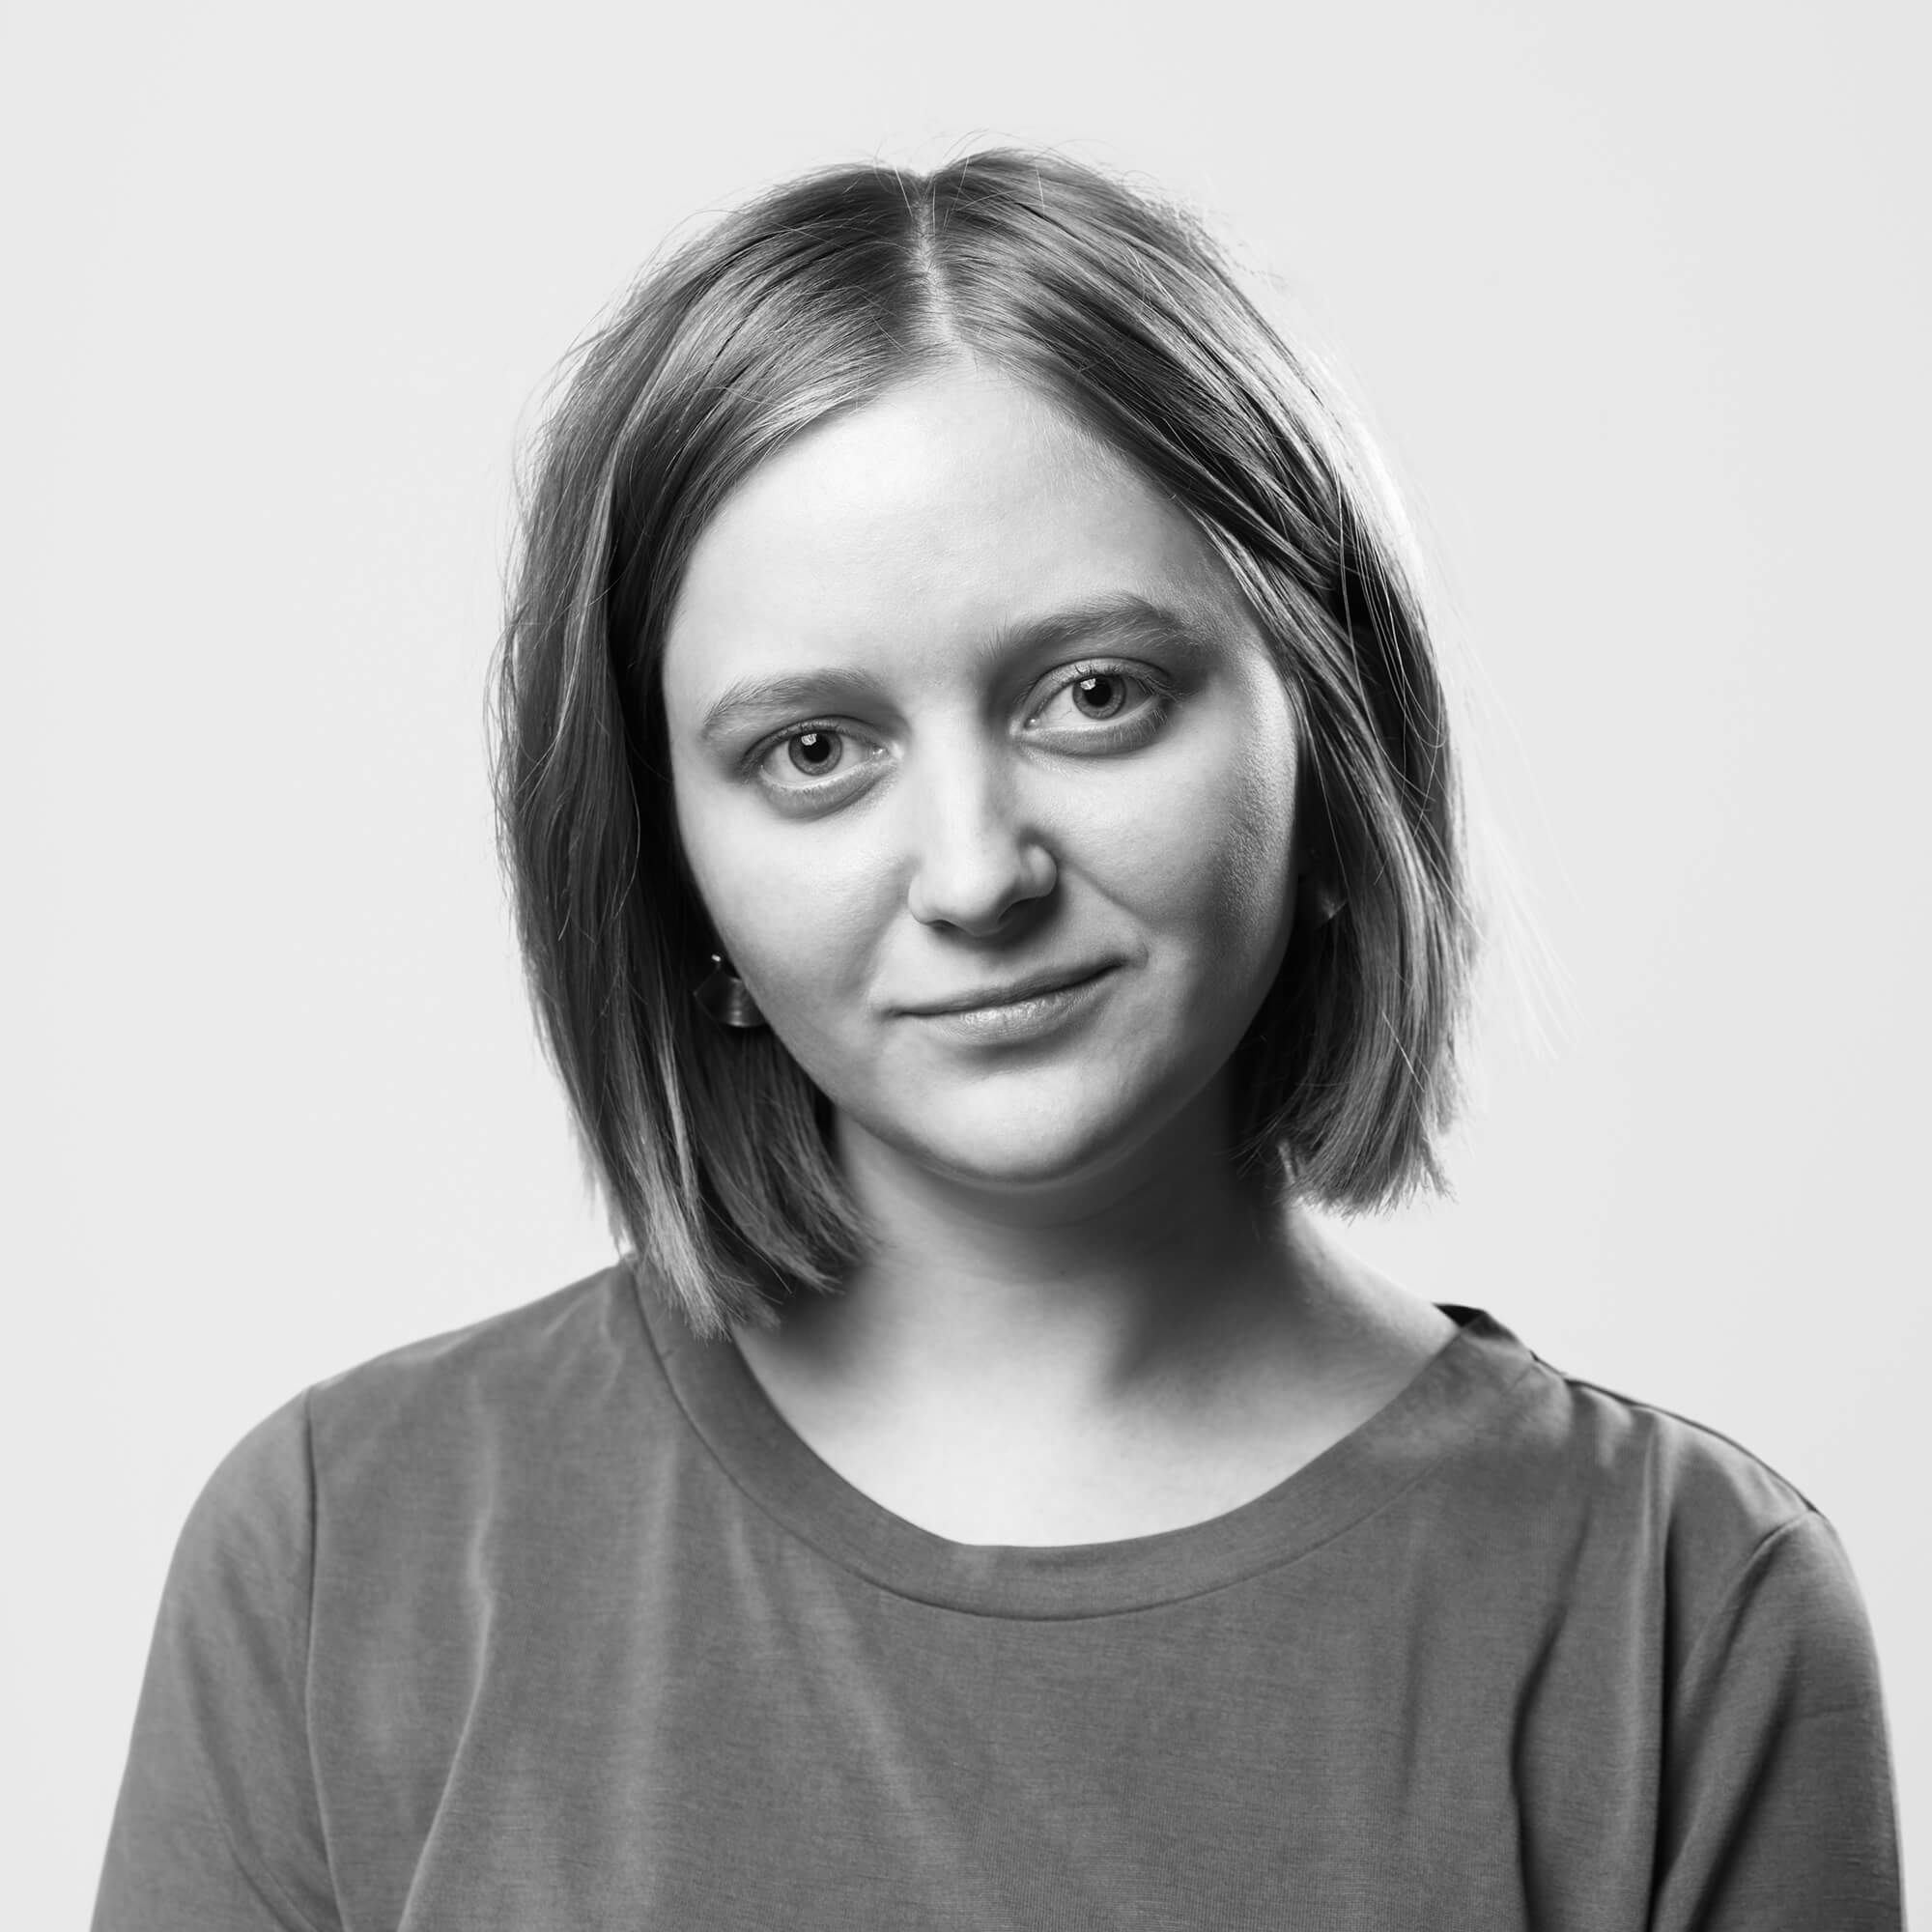 Alina Khudyakova